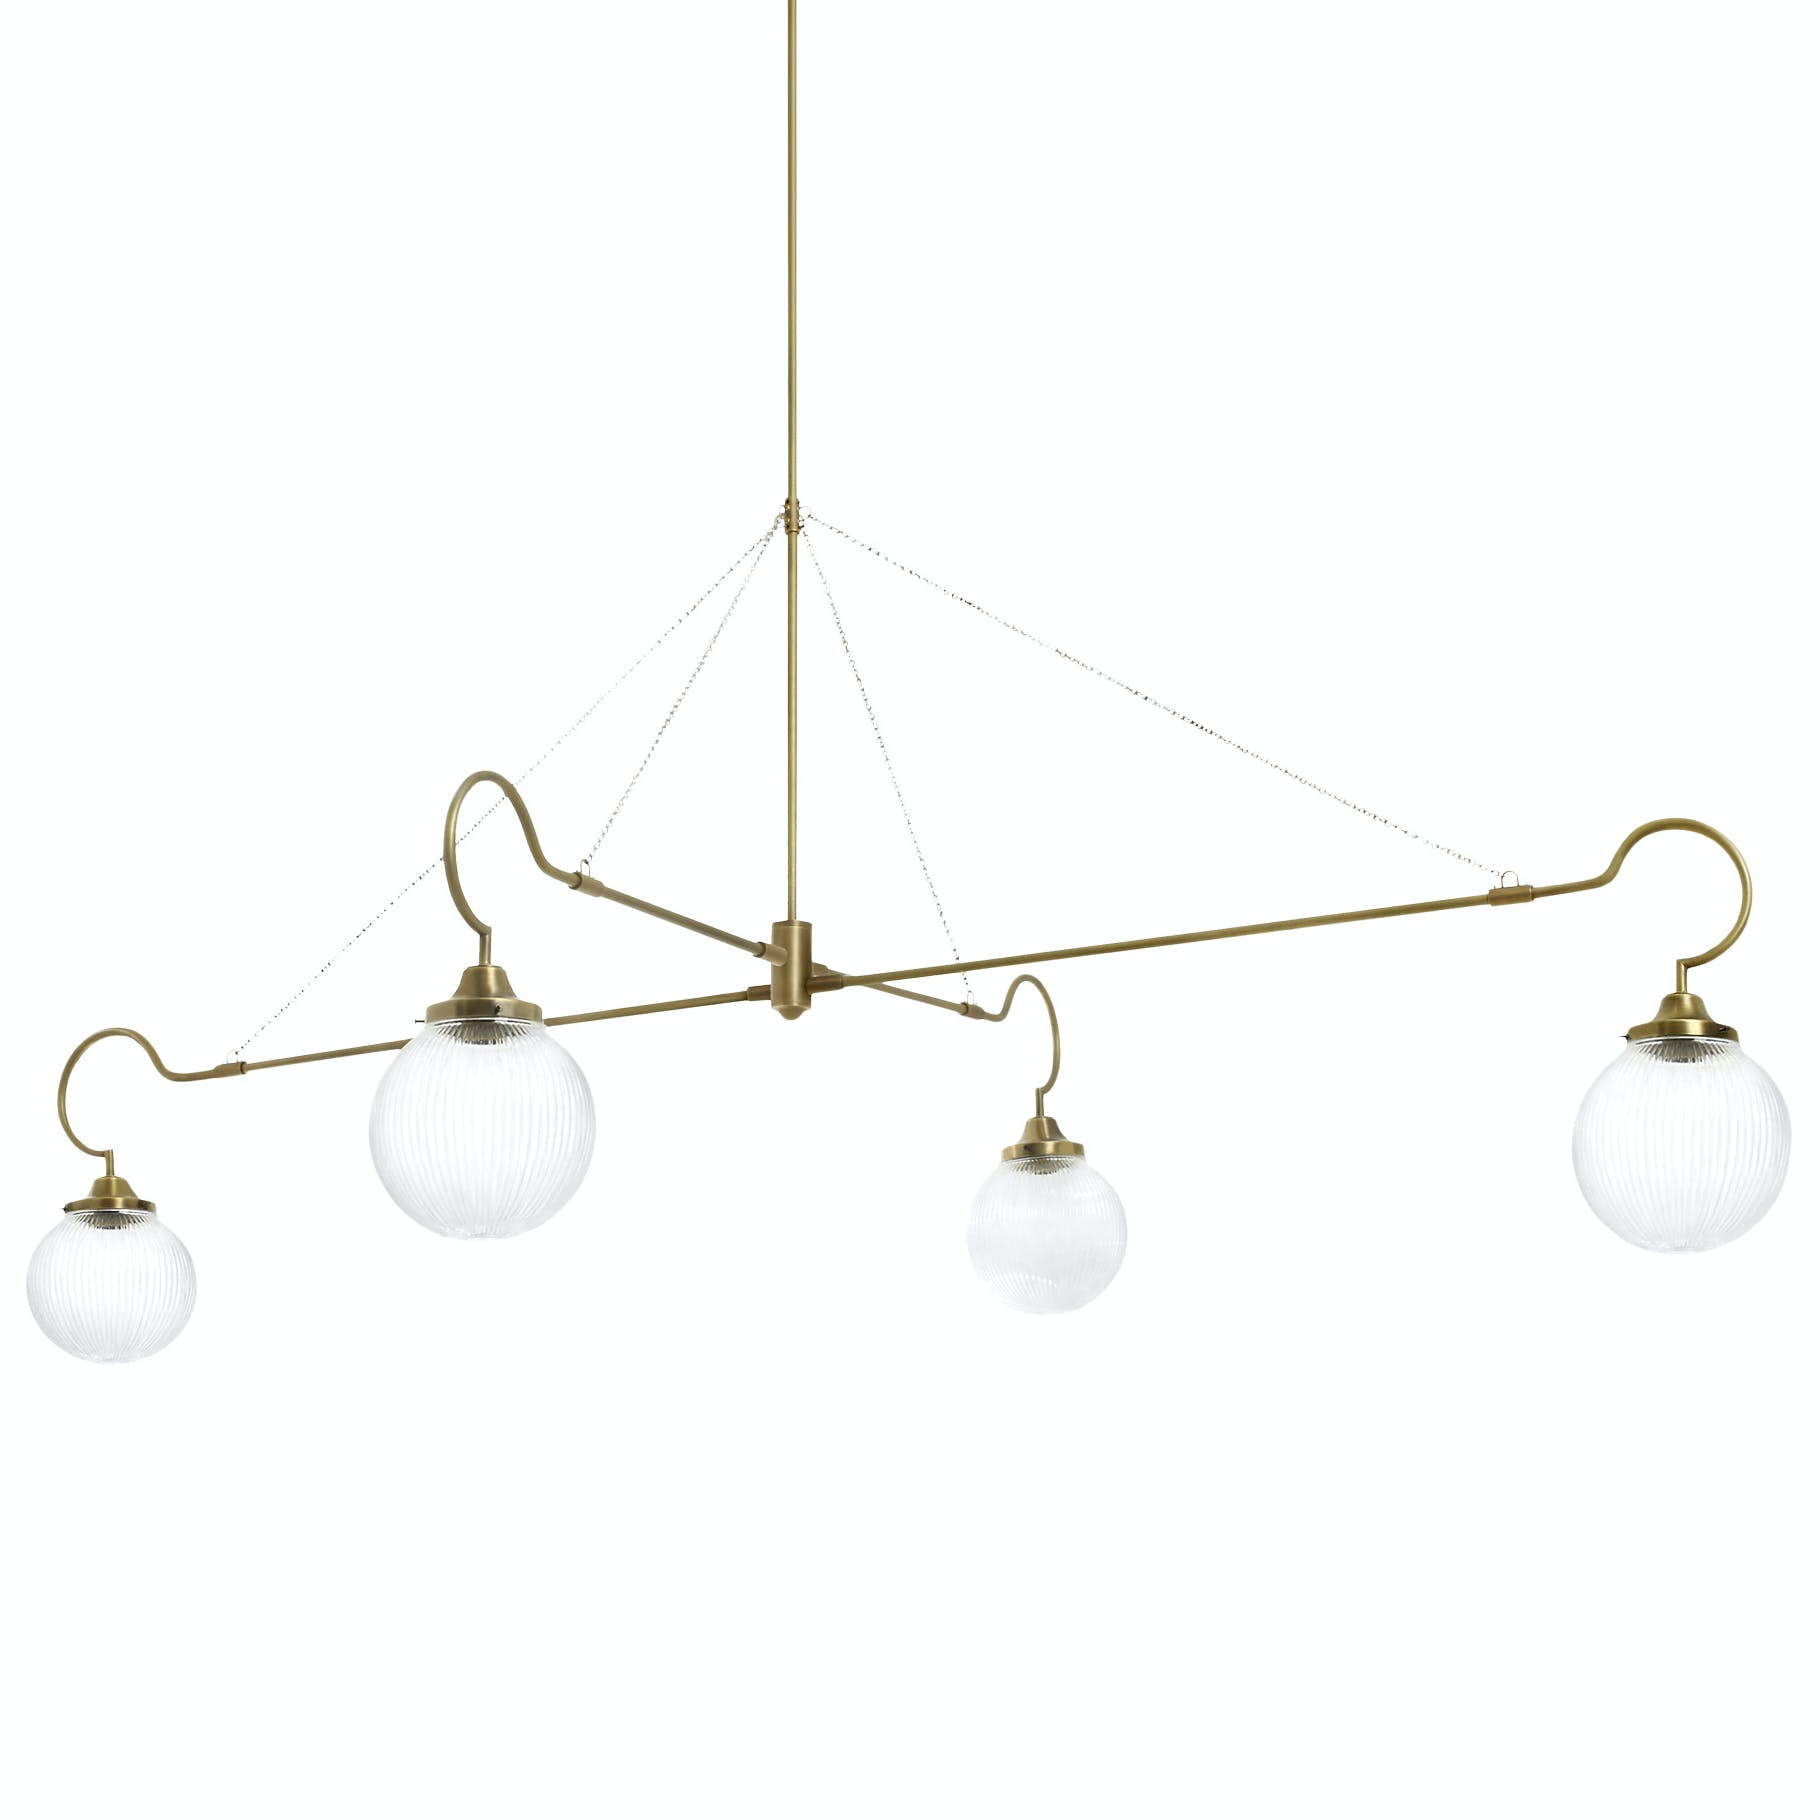 Cto-lighting-floren-four-arm-hanging-haute-living-thumbnail